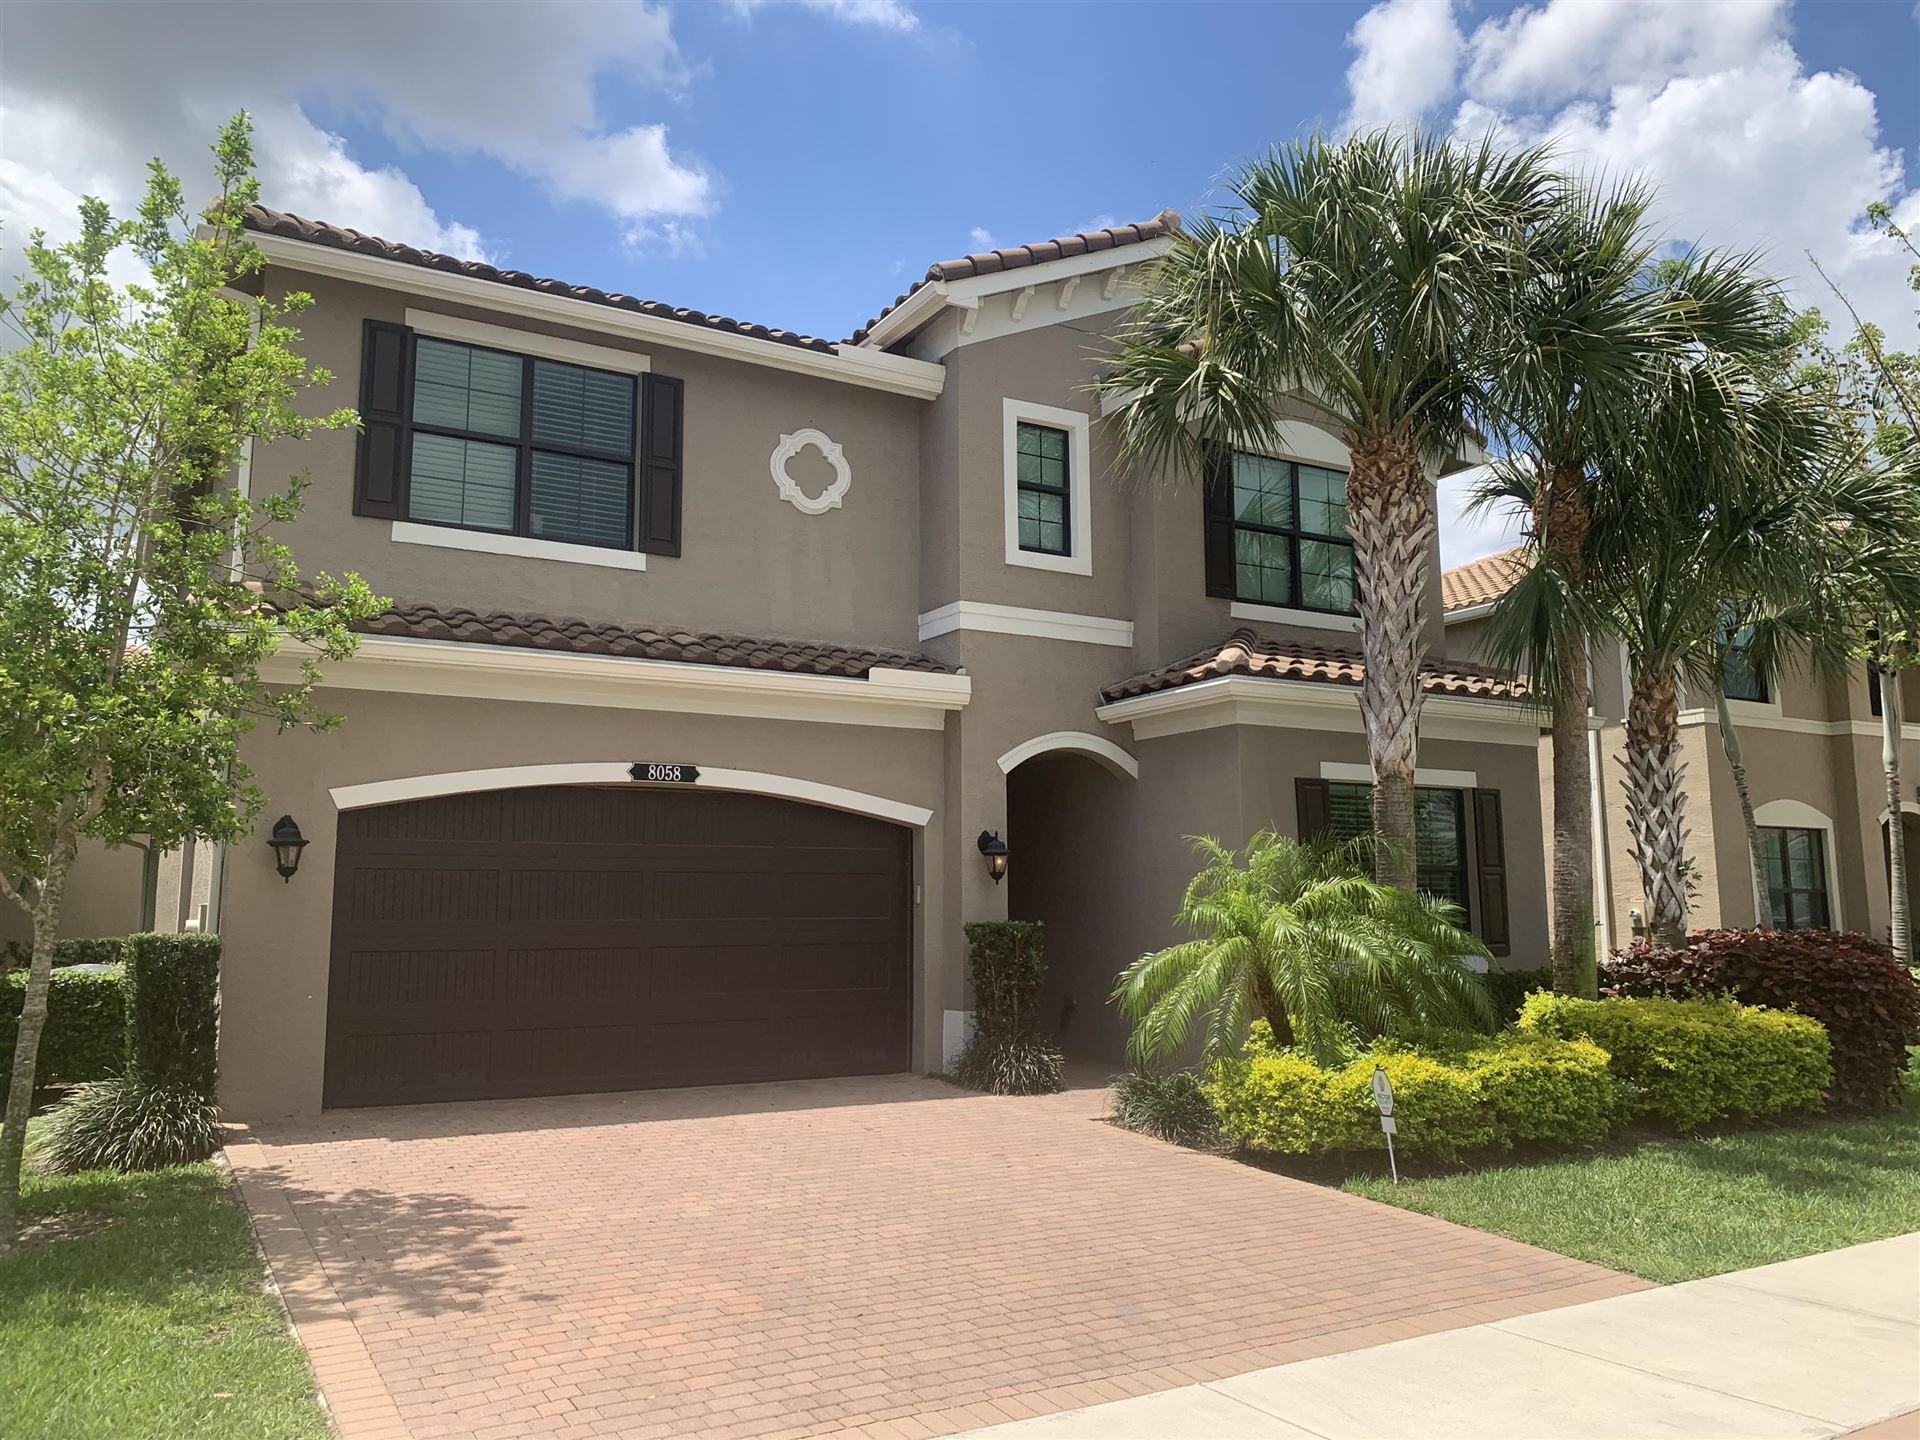 8058 Green Tourmaline Ter Terrace, Delray Beach, FL 33446 - MLS#: RX-10713176